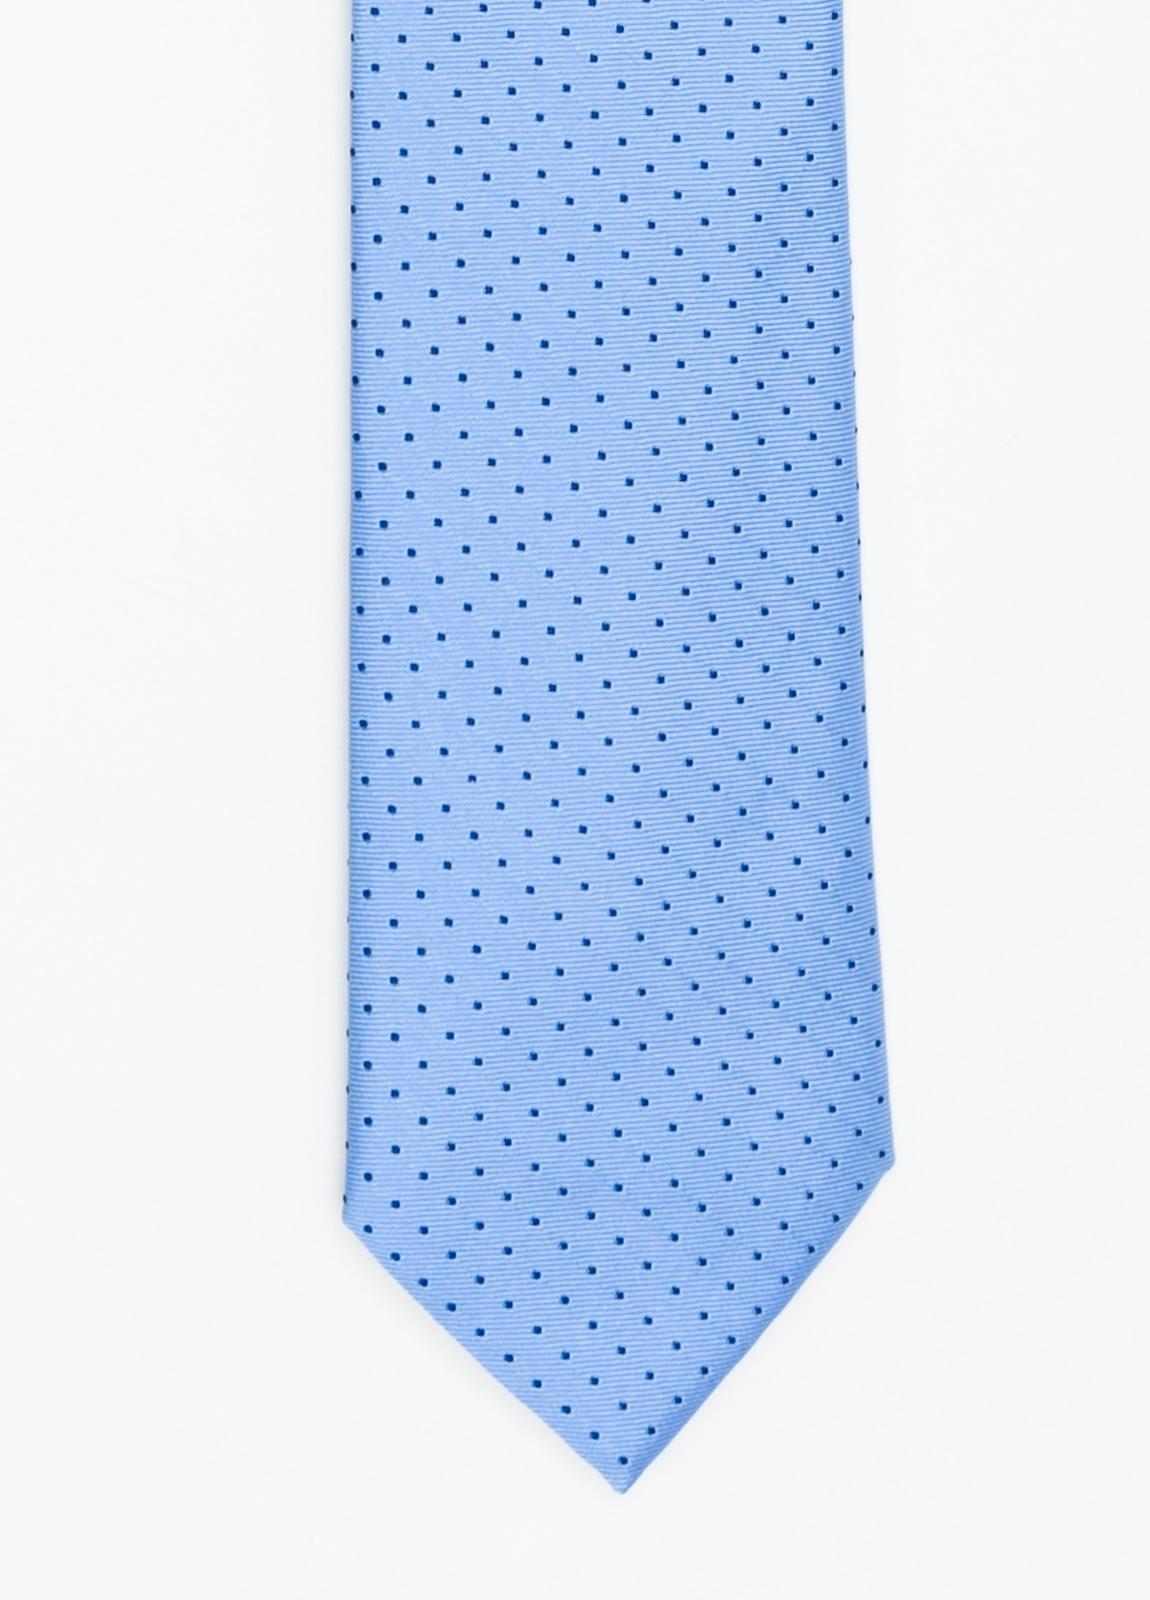 Corbata Formal Wear micro dibujo color azul celeste. Pala 7,5 cm. 100% Seda.